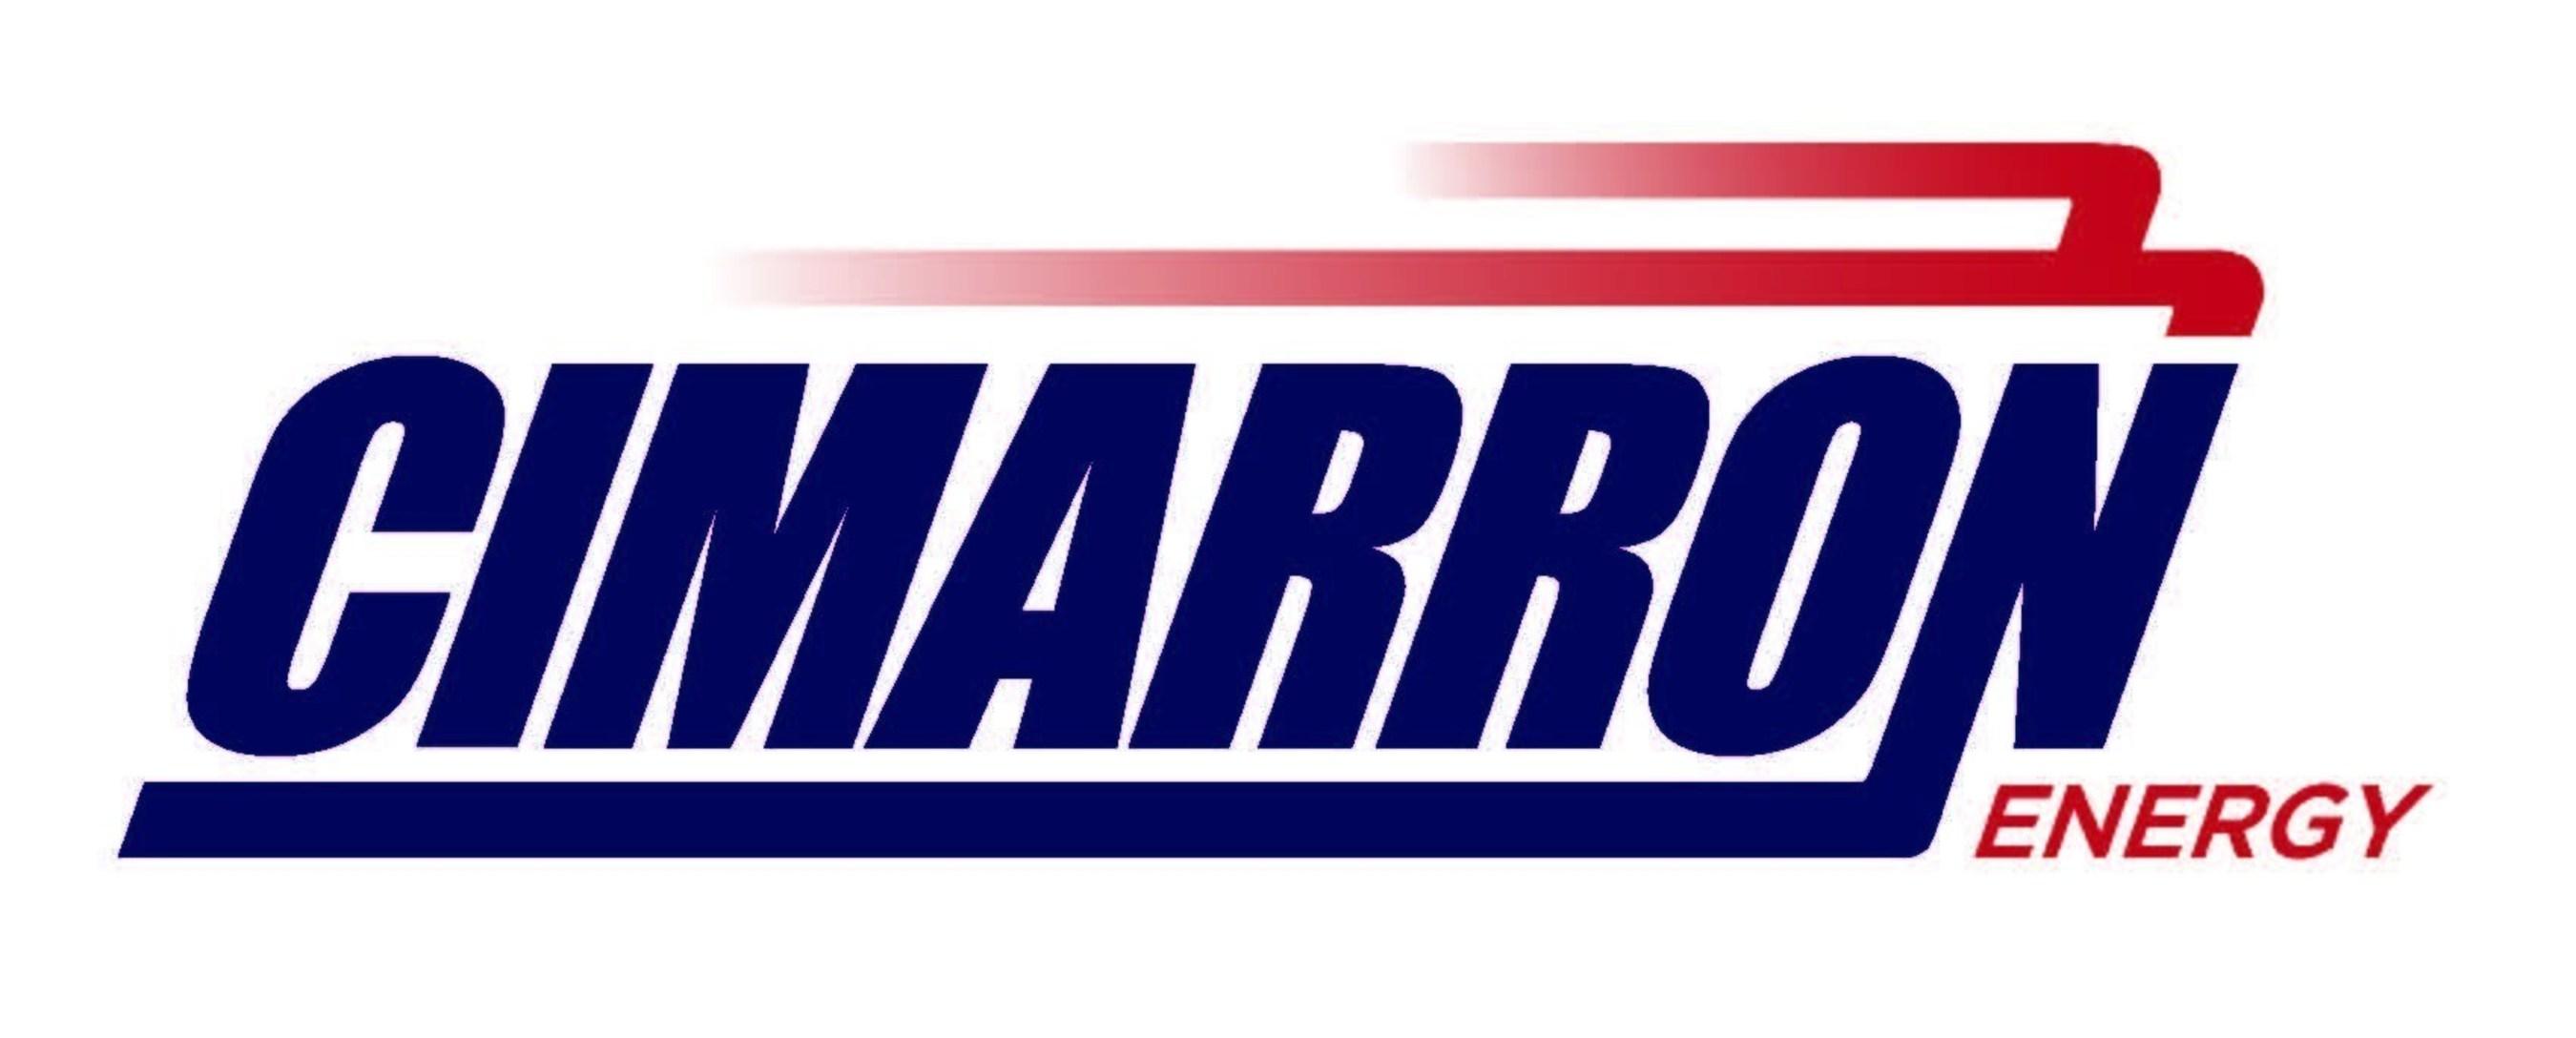 Cimarron Energy Acquires Diverse Energy Systems Assets